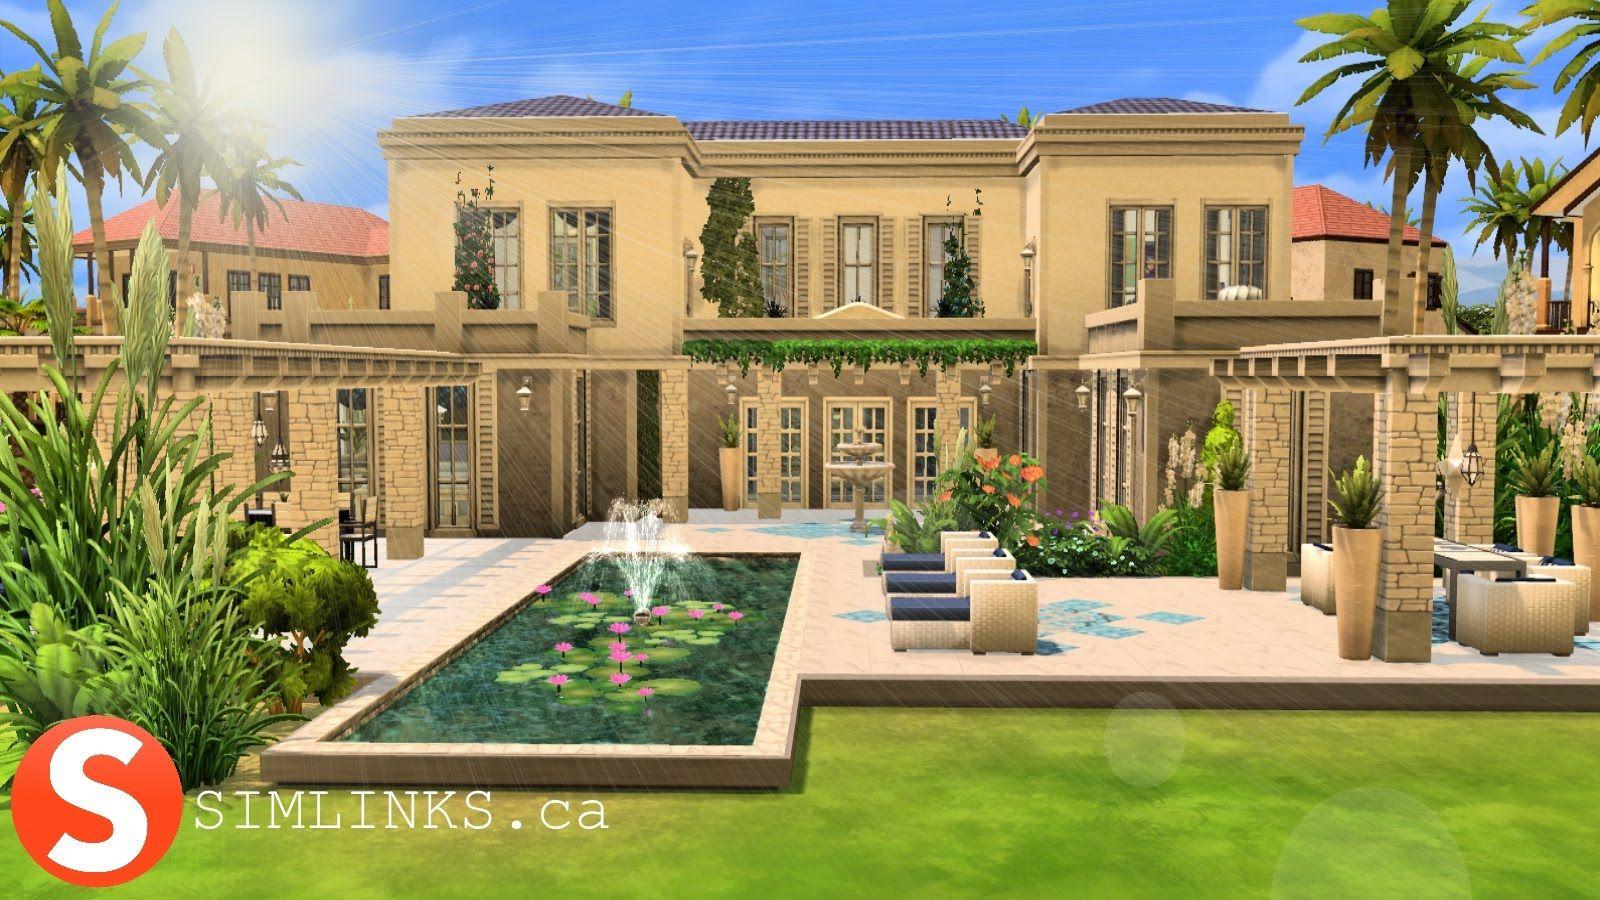 The Sims 4 Speed Build The Greek Villa Greek villas